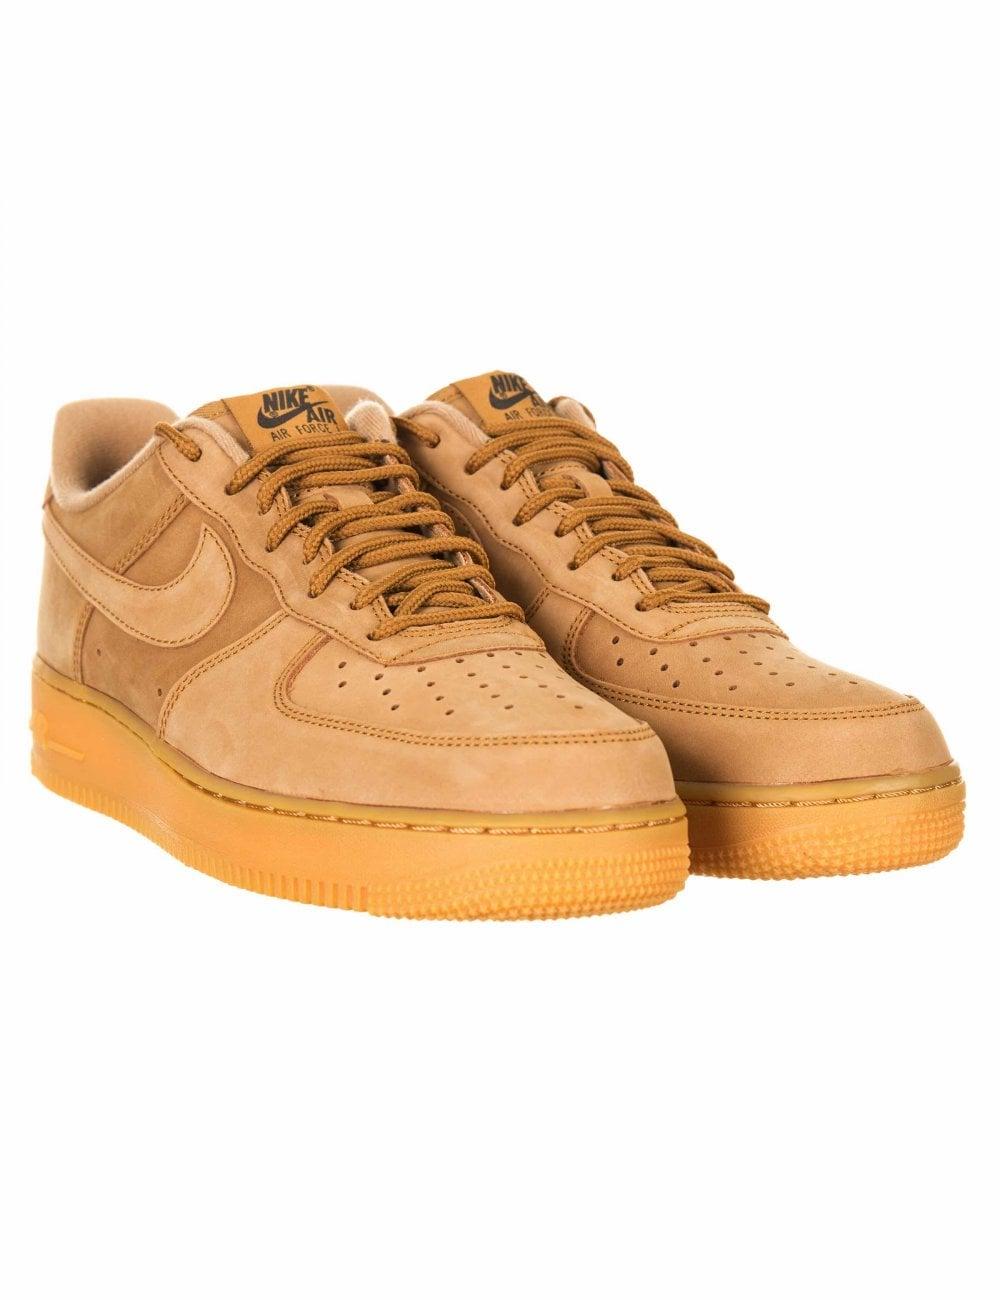 d1a46bf8c31dd Nike Air Force 1  07 WB Trainers - Wheat - Footwear from Fat Buddha ...